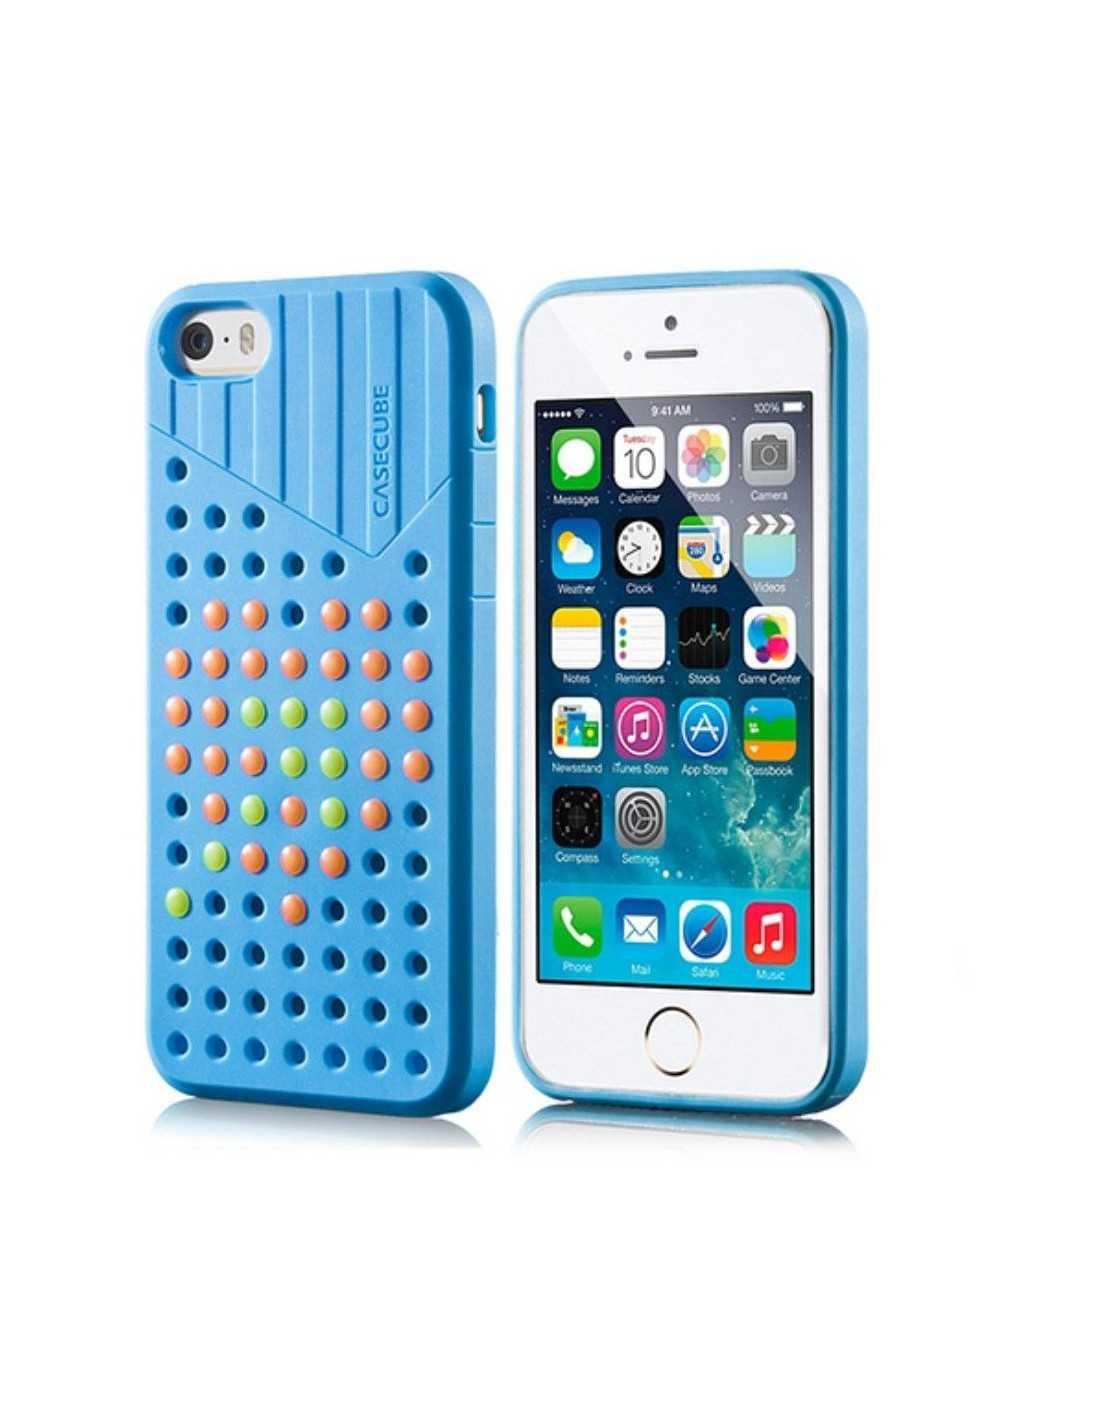 coque iphone 5s 5 fantaisie silicone points colores bleu